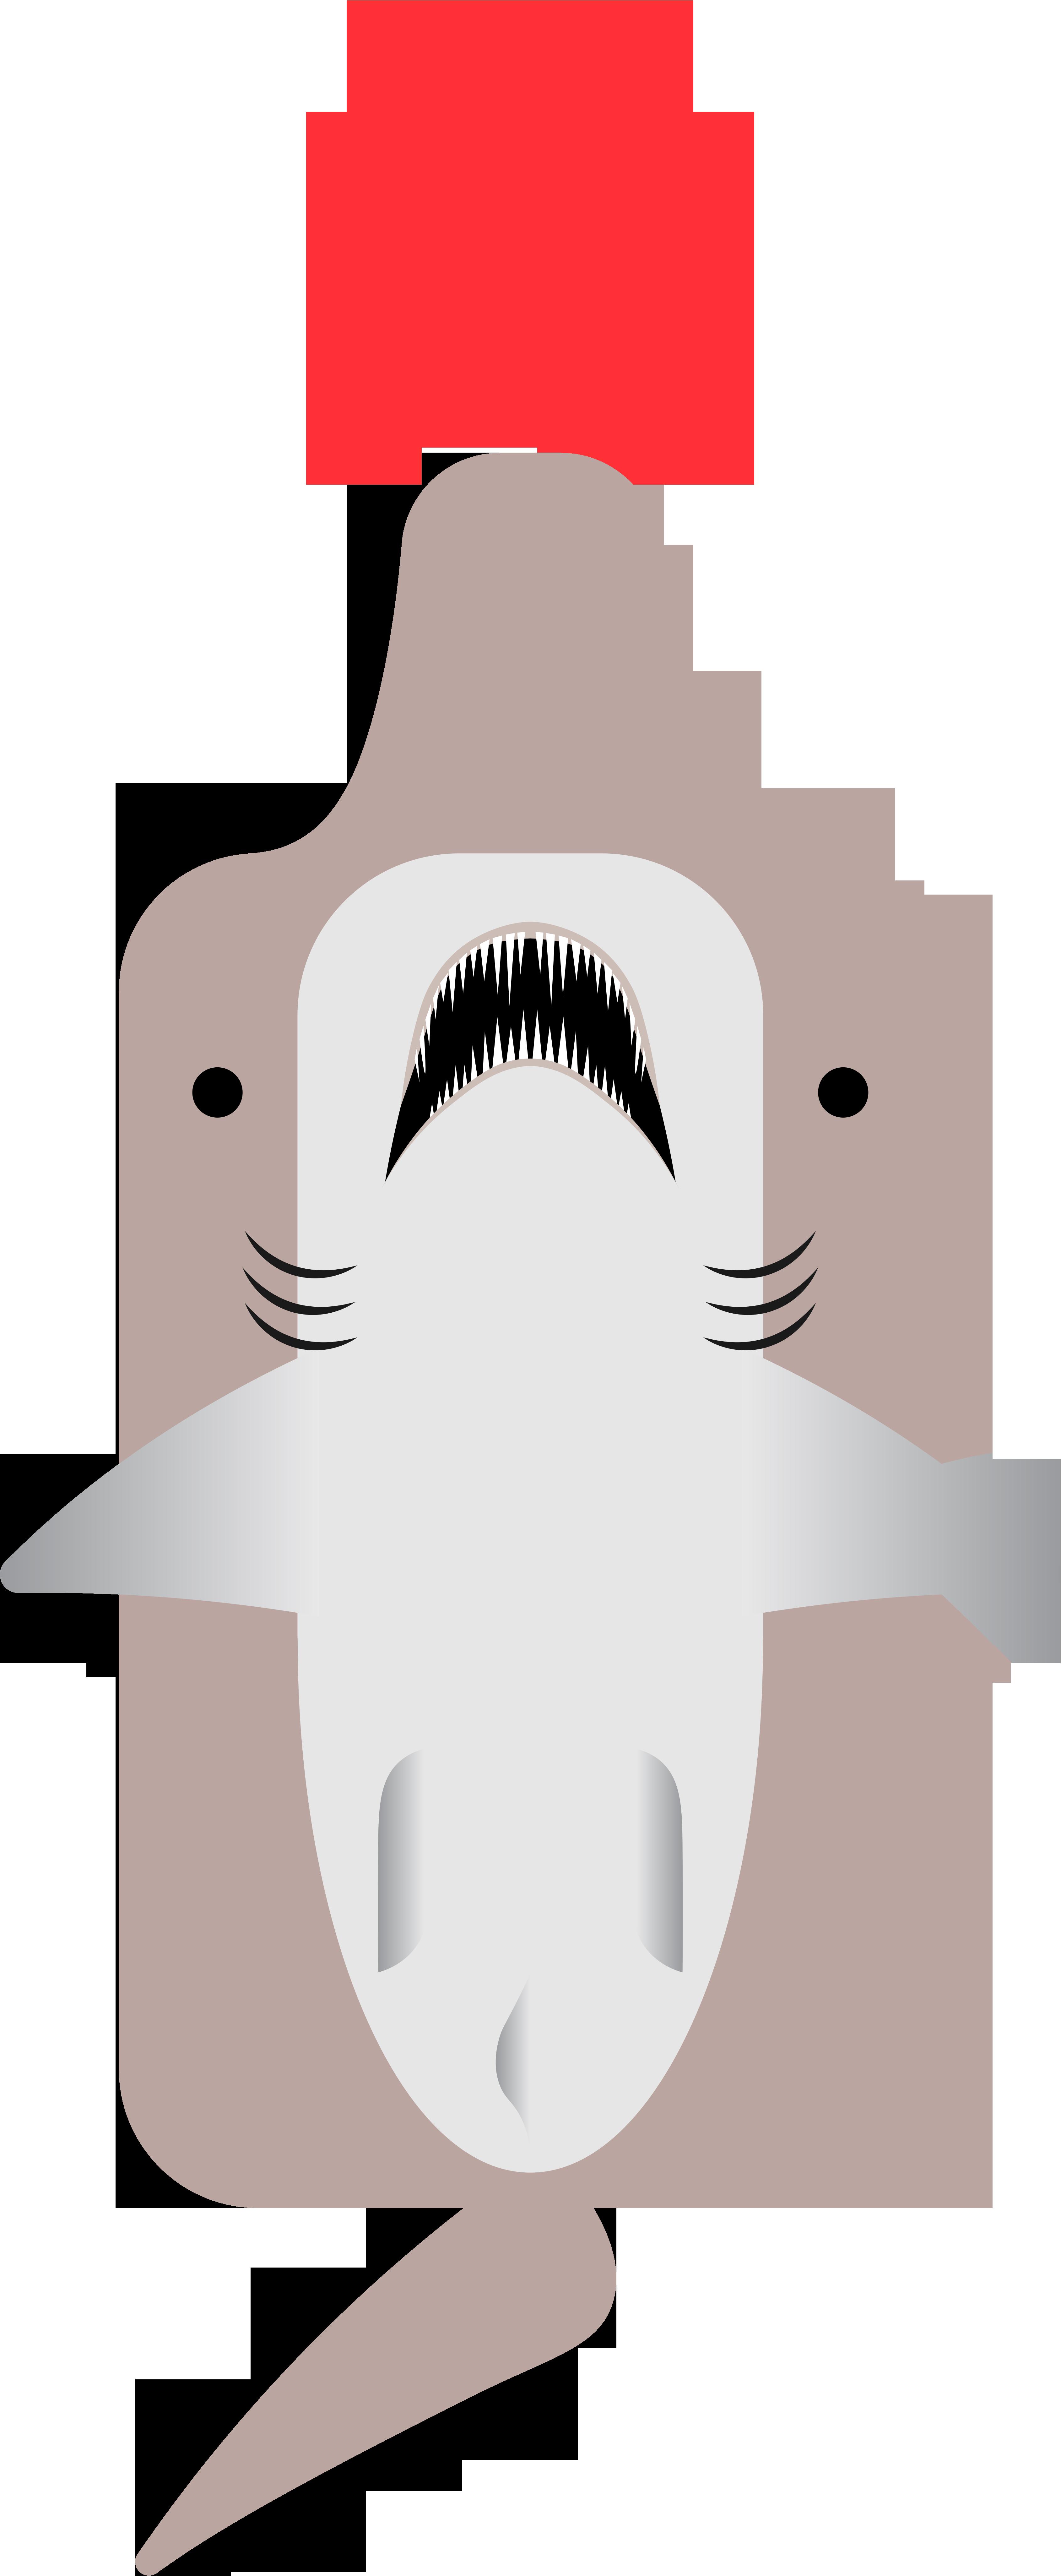 Clipart shark frilled shark. Animal goblin deeeepioartworks animalanimal